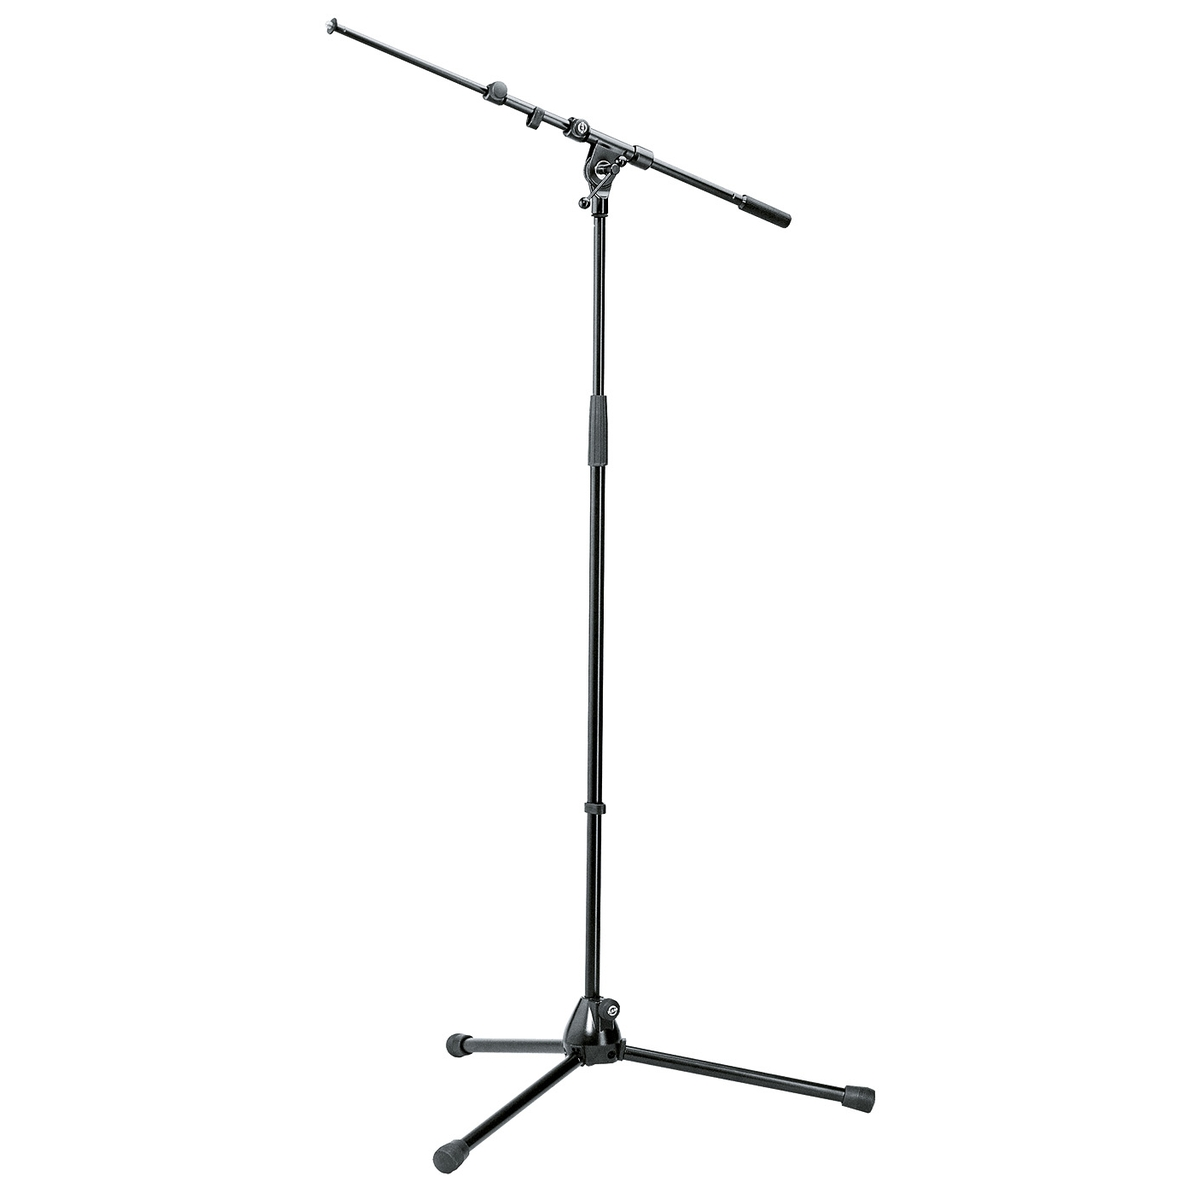 K&M 210/9 Mikrofonstativ PROLINE mit ausziehbarem Galgen schwarz